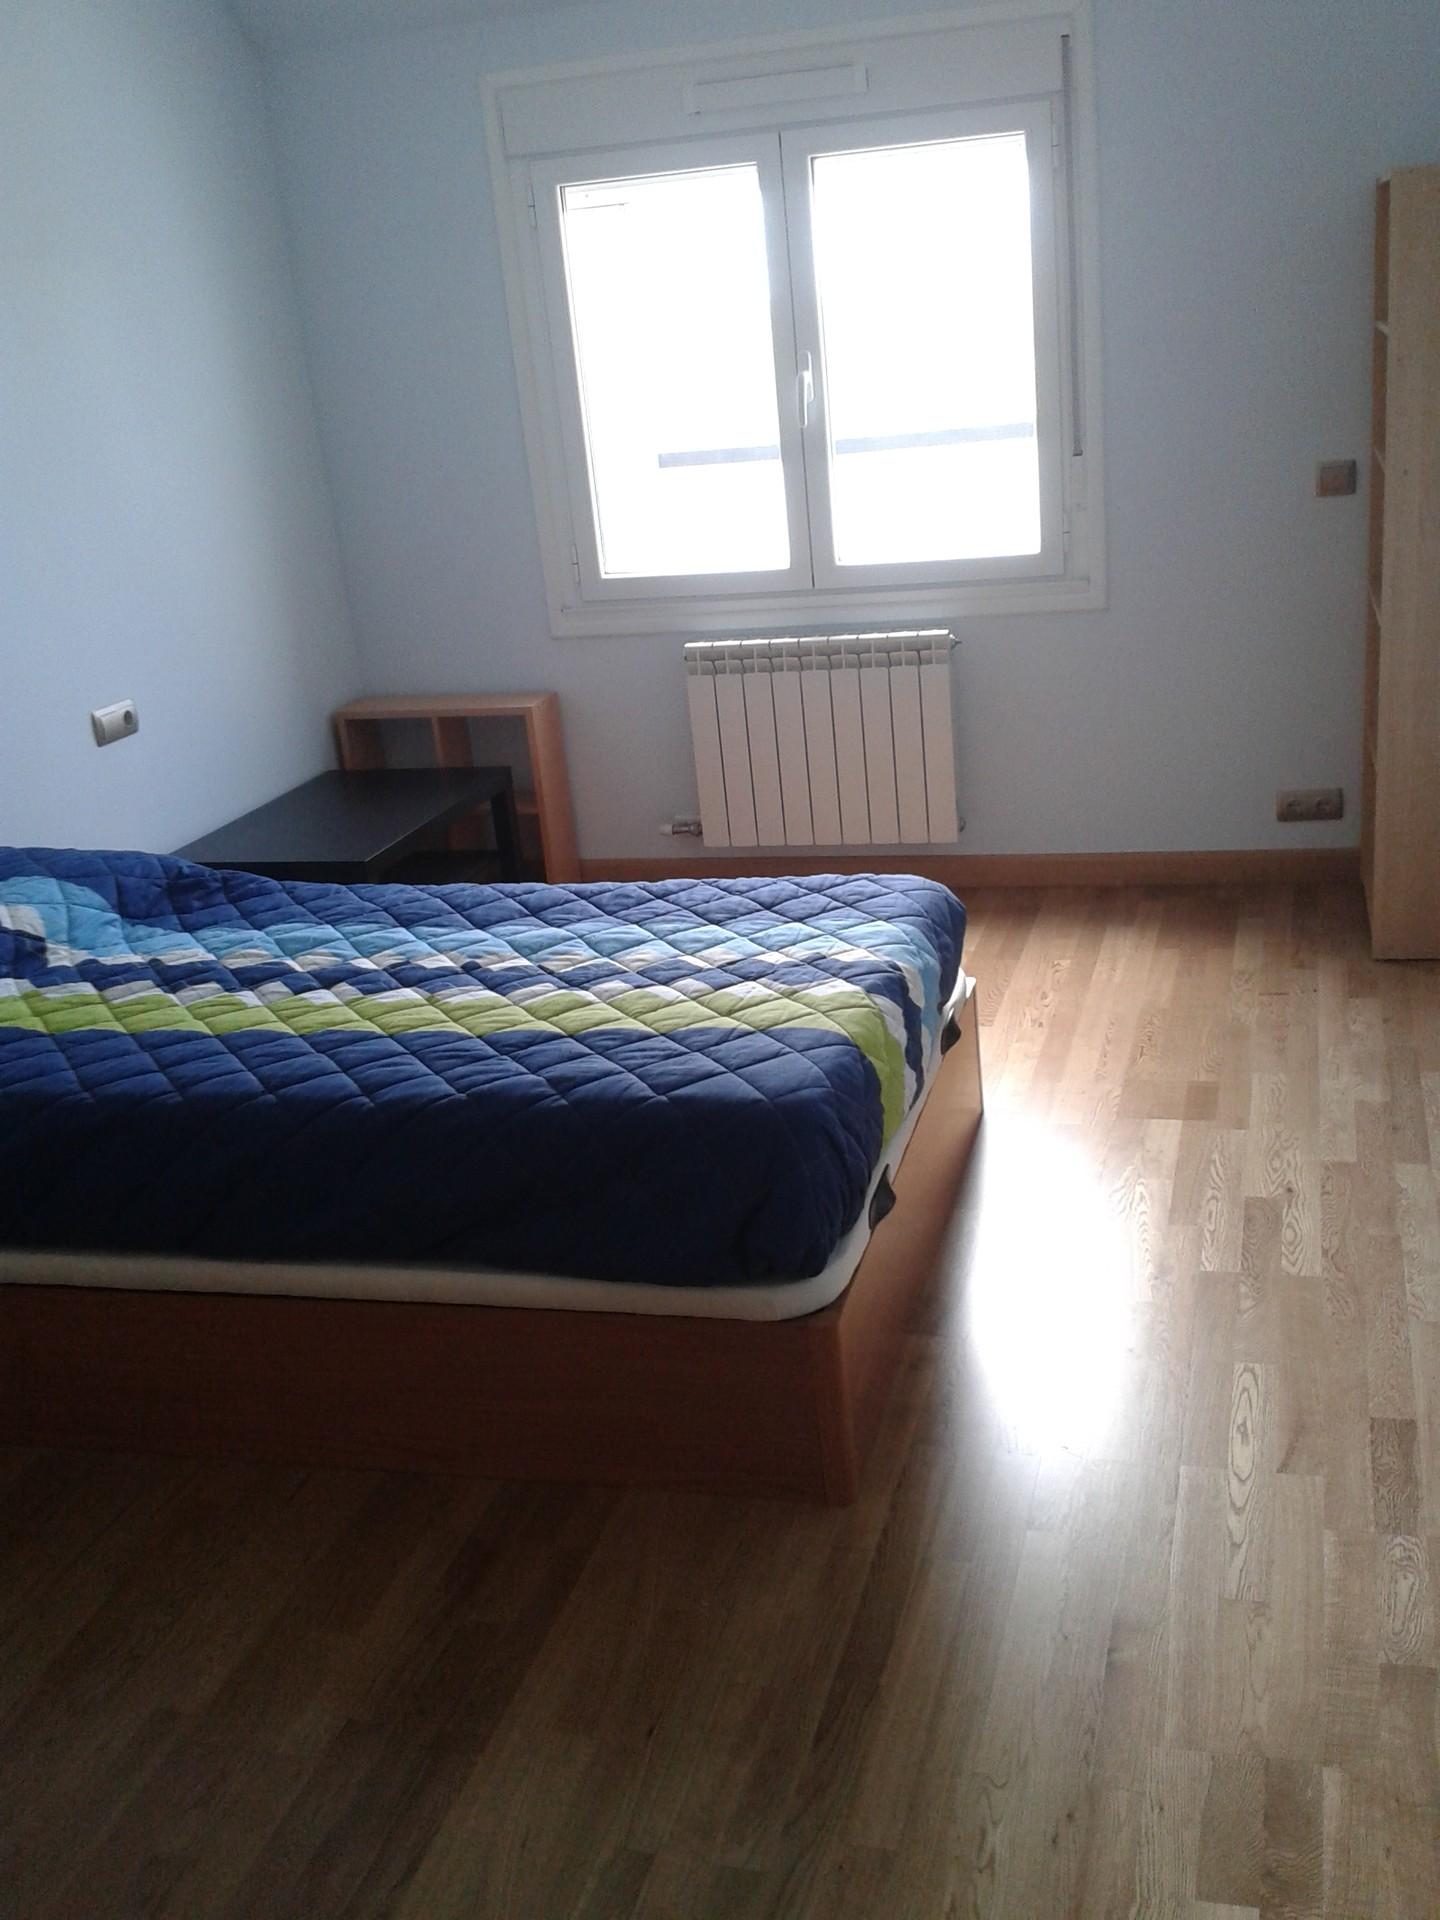 Alquiler de habitaci n con ba o propio alquiler habitaciones leon - Alquiler habitacion donosti ...